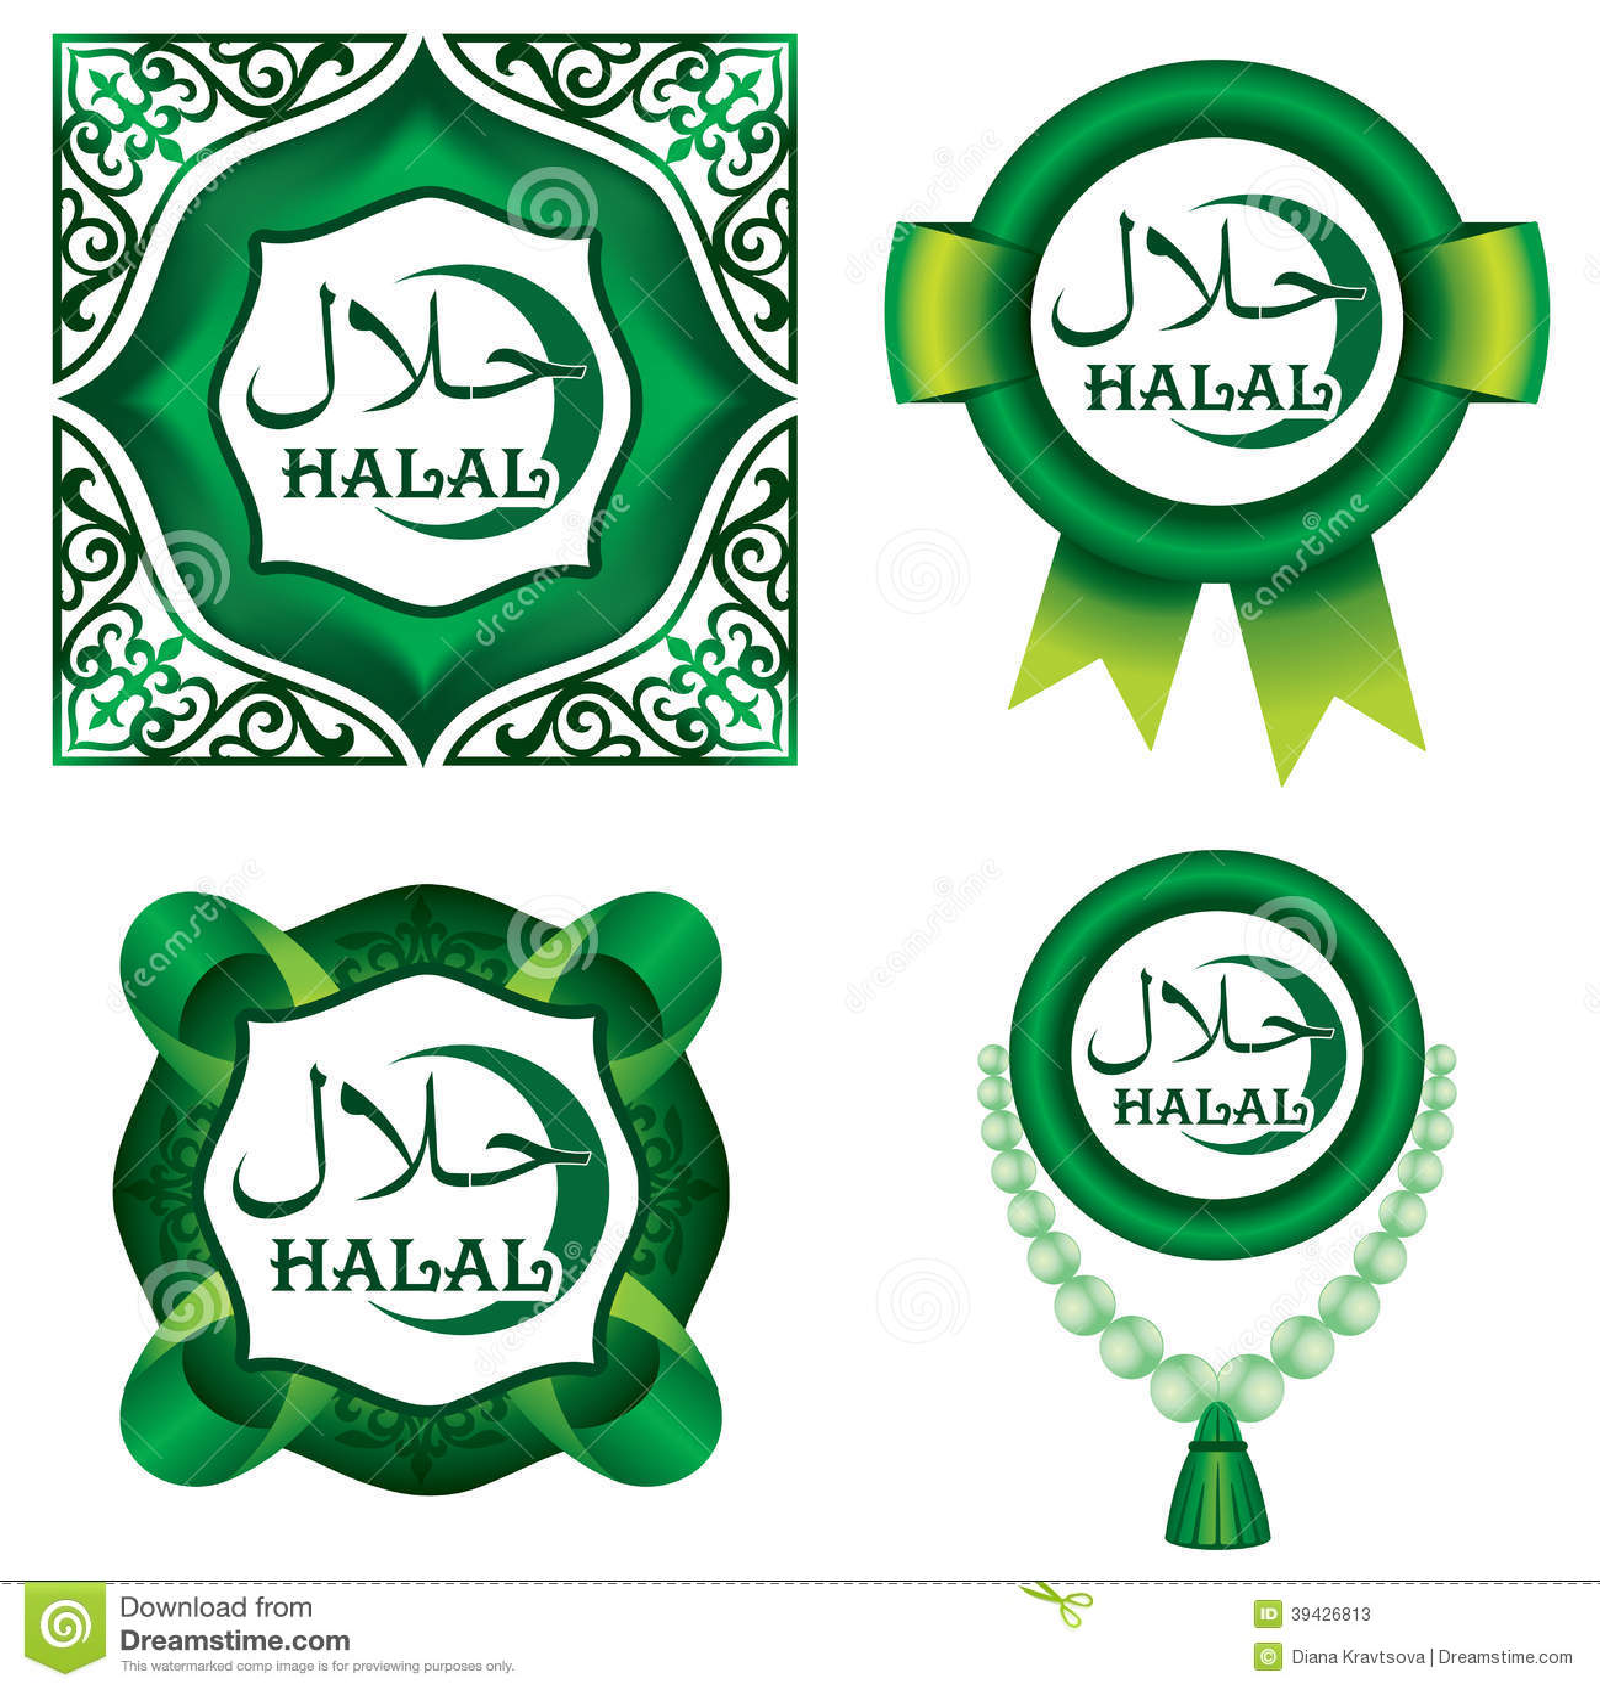 Set of halal signs stock vector illustration of element 39426813 set of halal signs buycottarizona